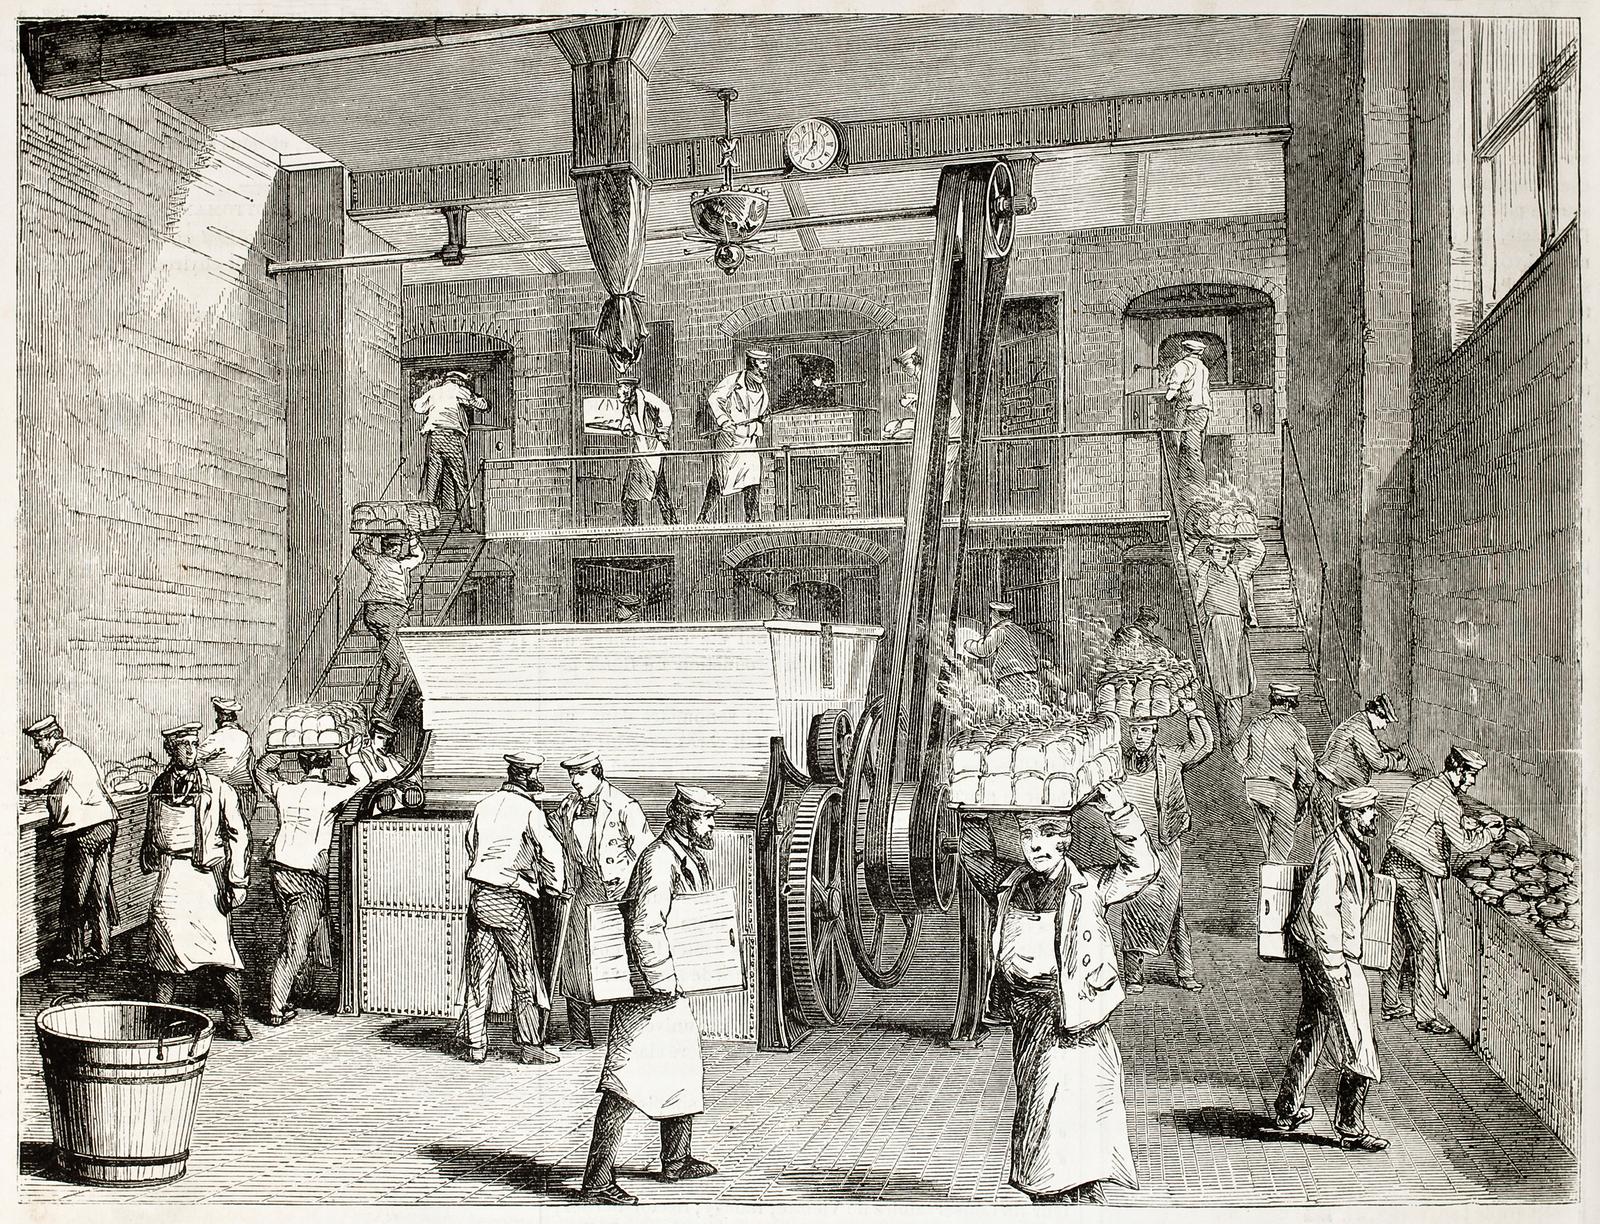 Stevens Company Bakery old illustration, London. By unidentified